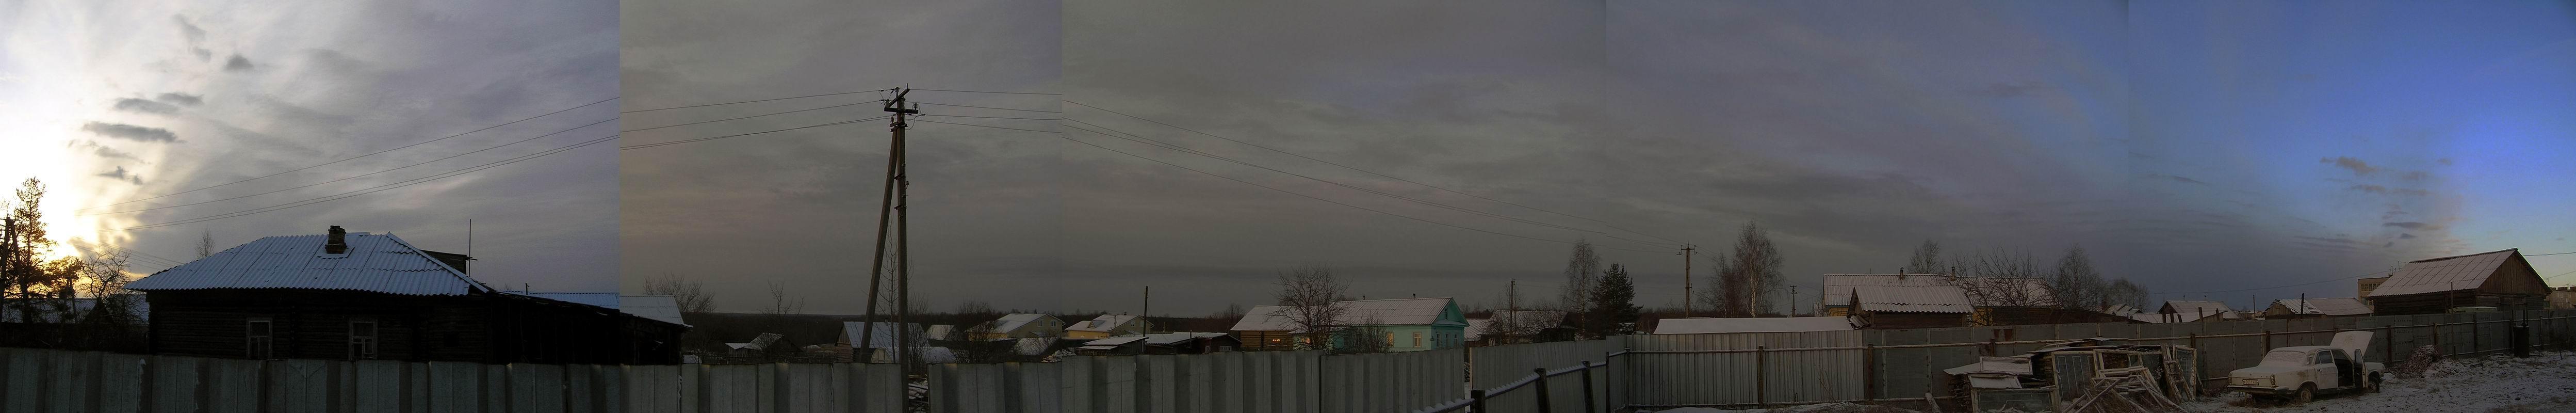 140404-Cherepovets-20km-Yaganovo-2